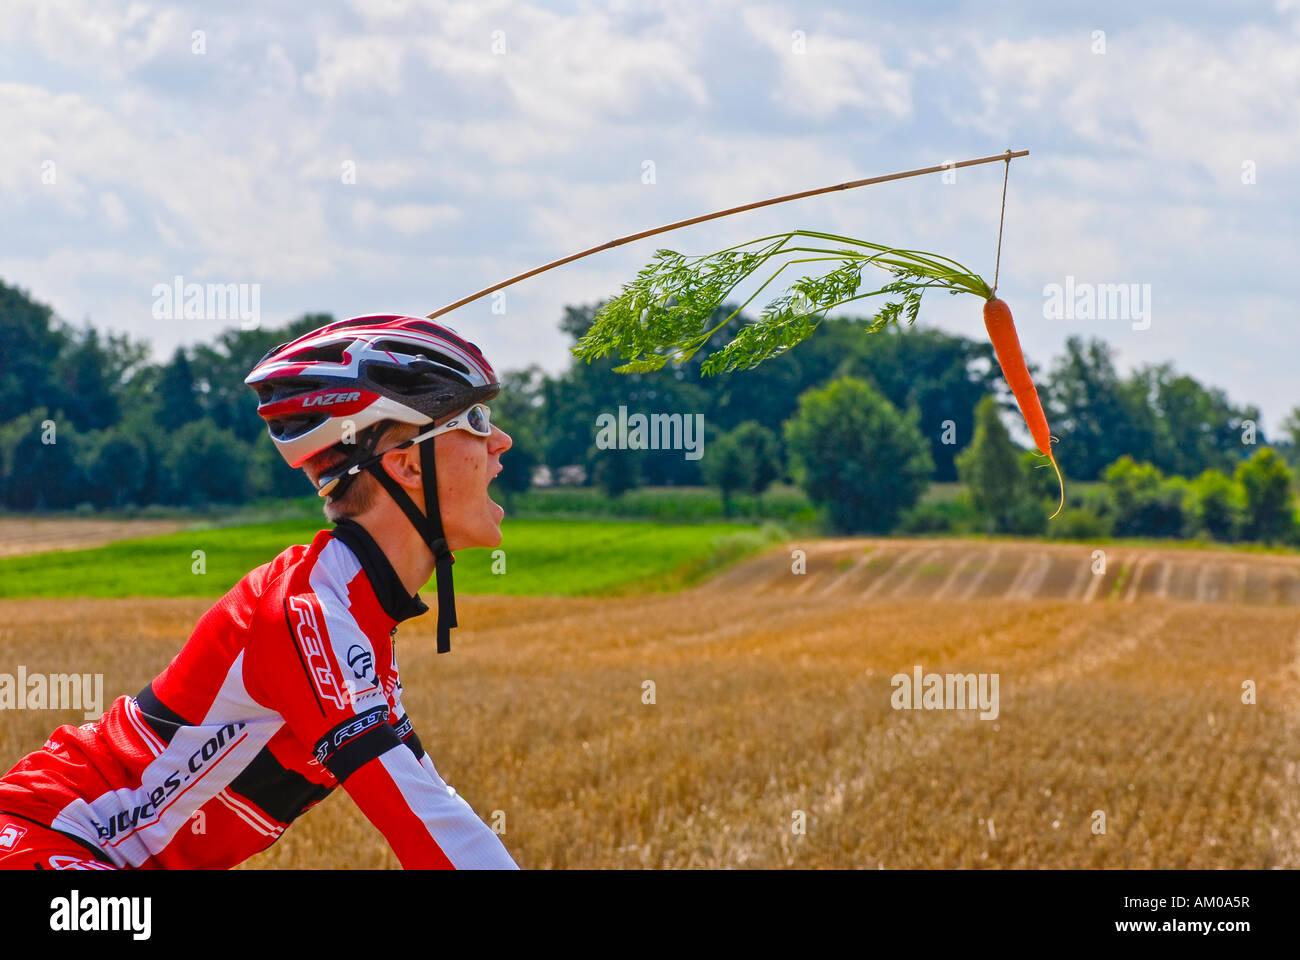 Cycling under doping suspicion - Stock Image